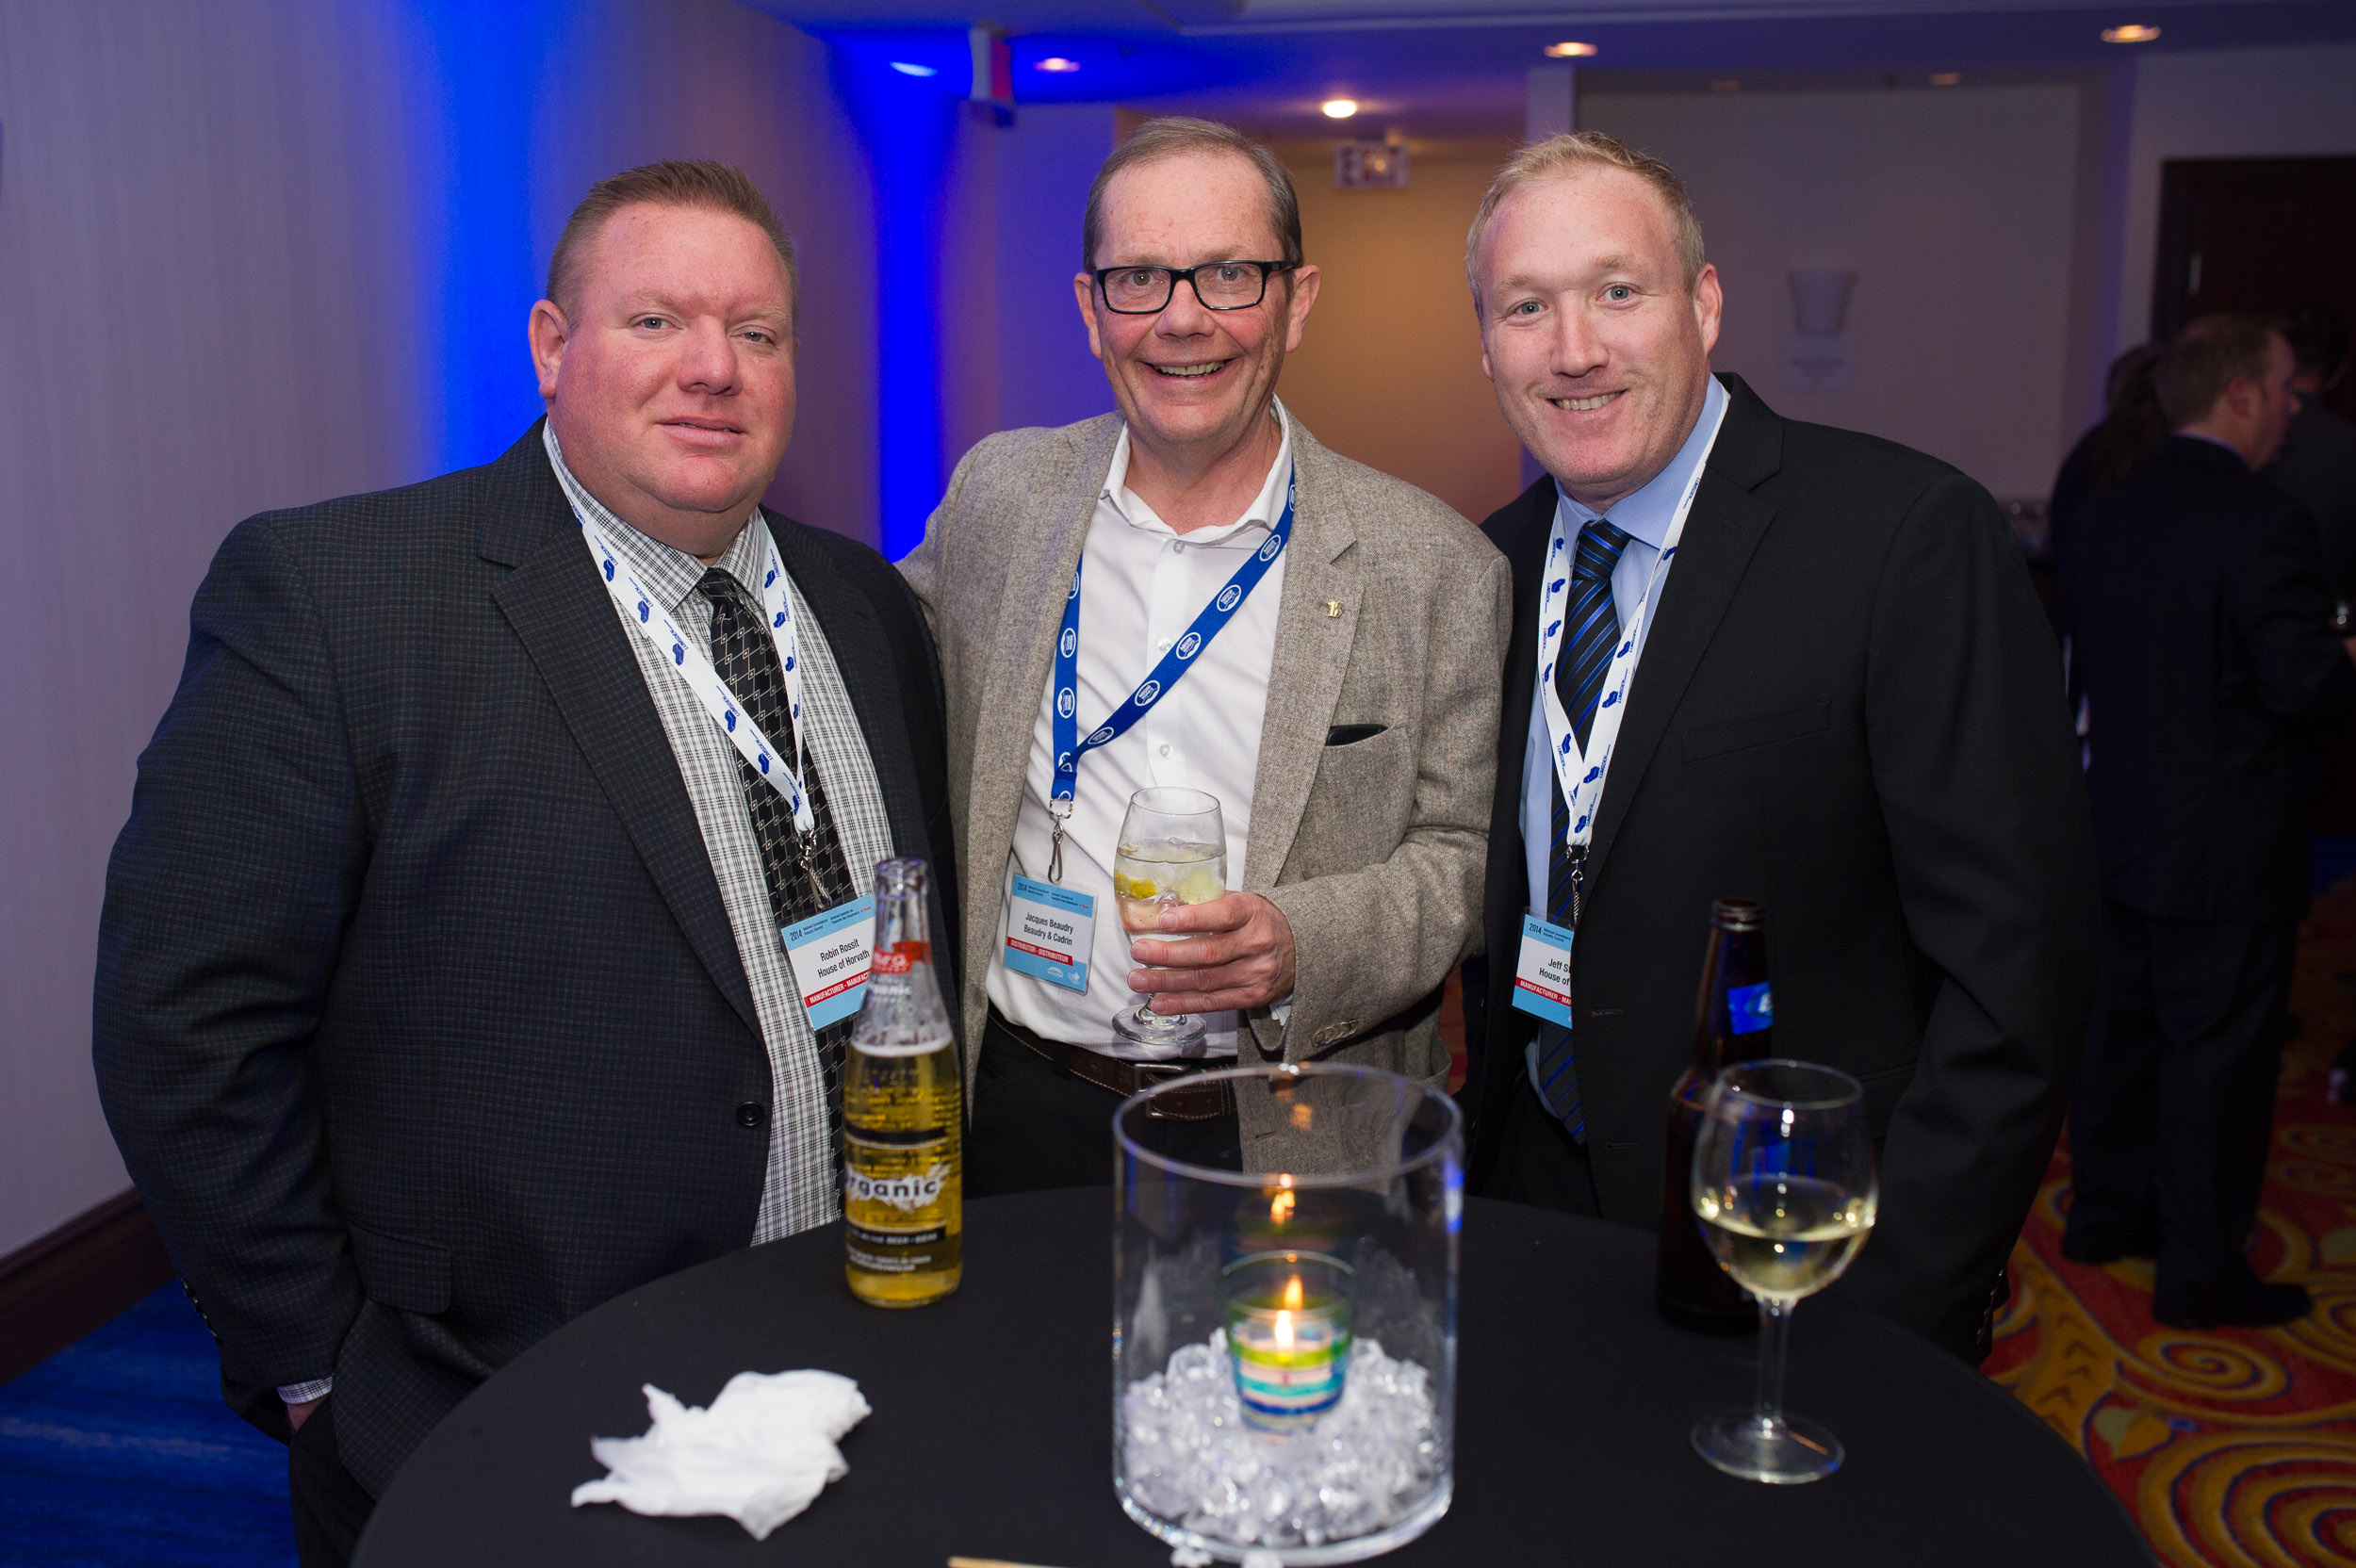 National Convenience Stores Distributors Association Awards Summ